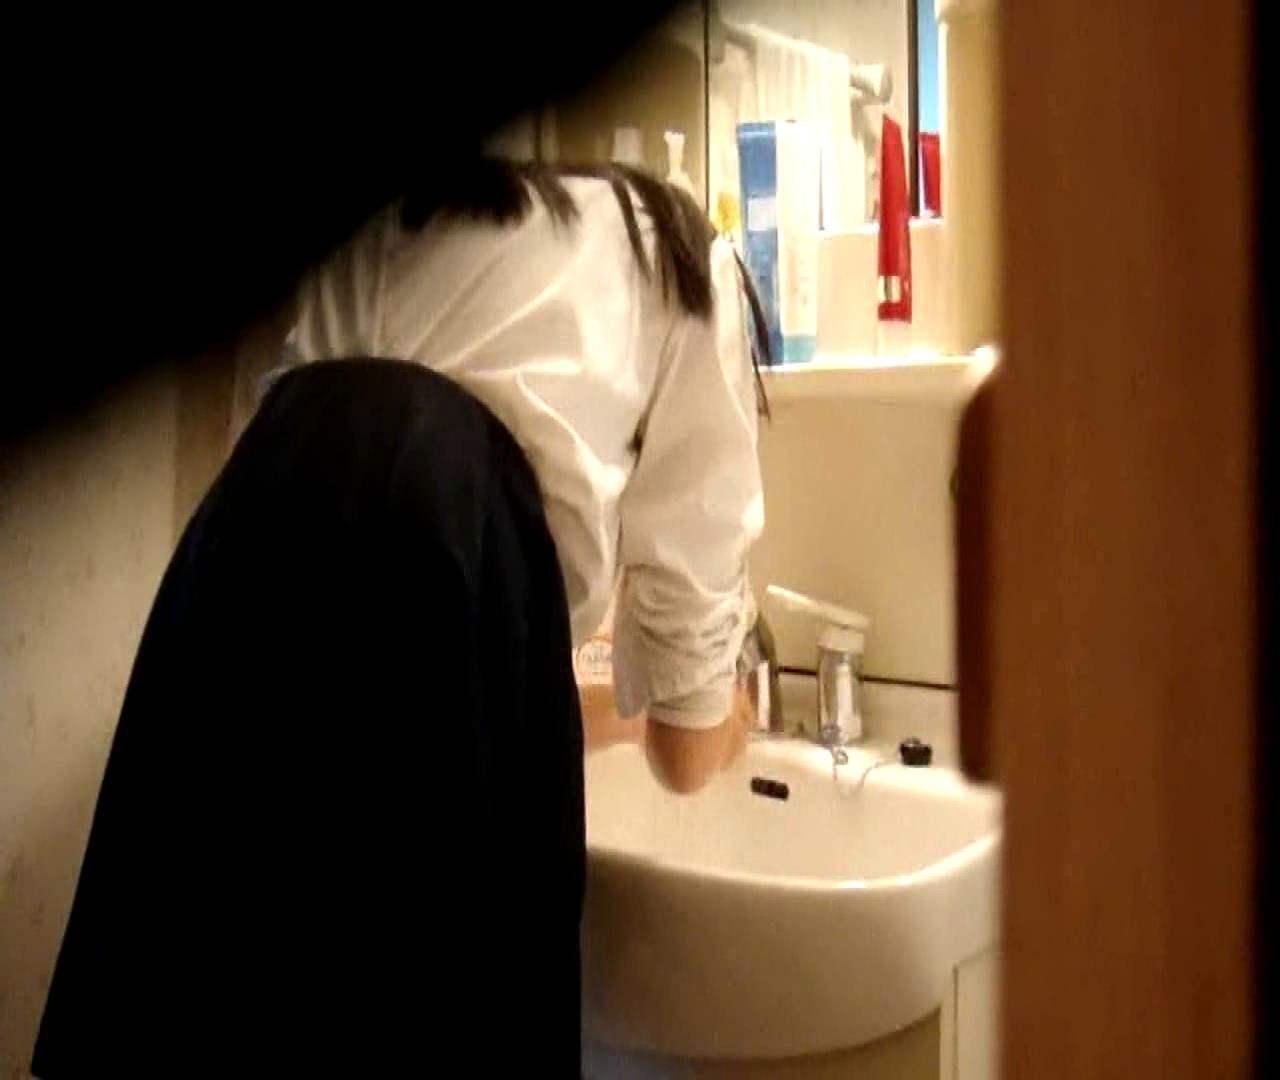 vol.5 まどかが帰宅後の洗顔後にブラを洗ってます。 ギャル達  112枚 56